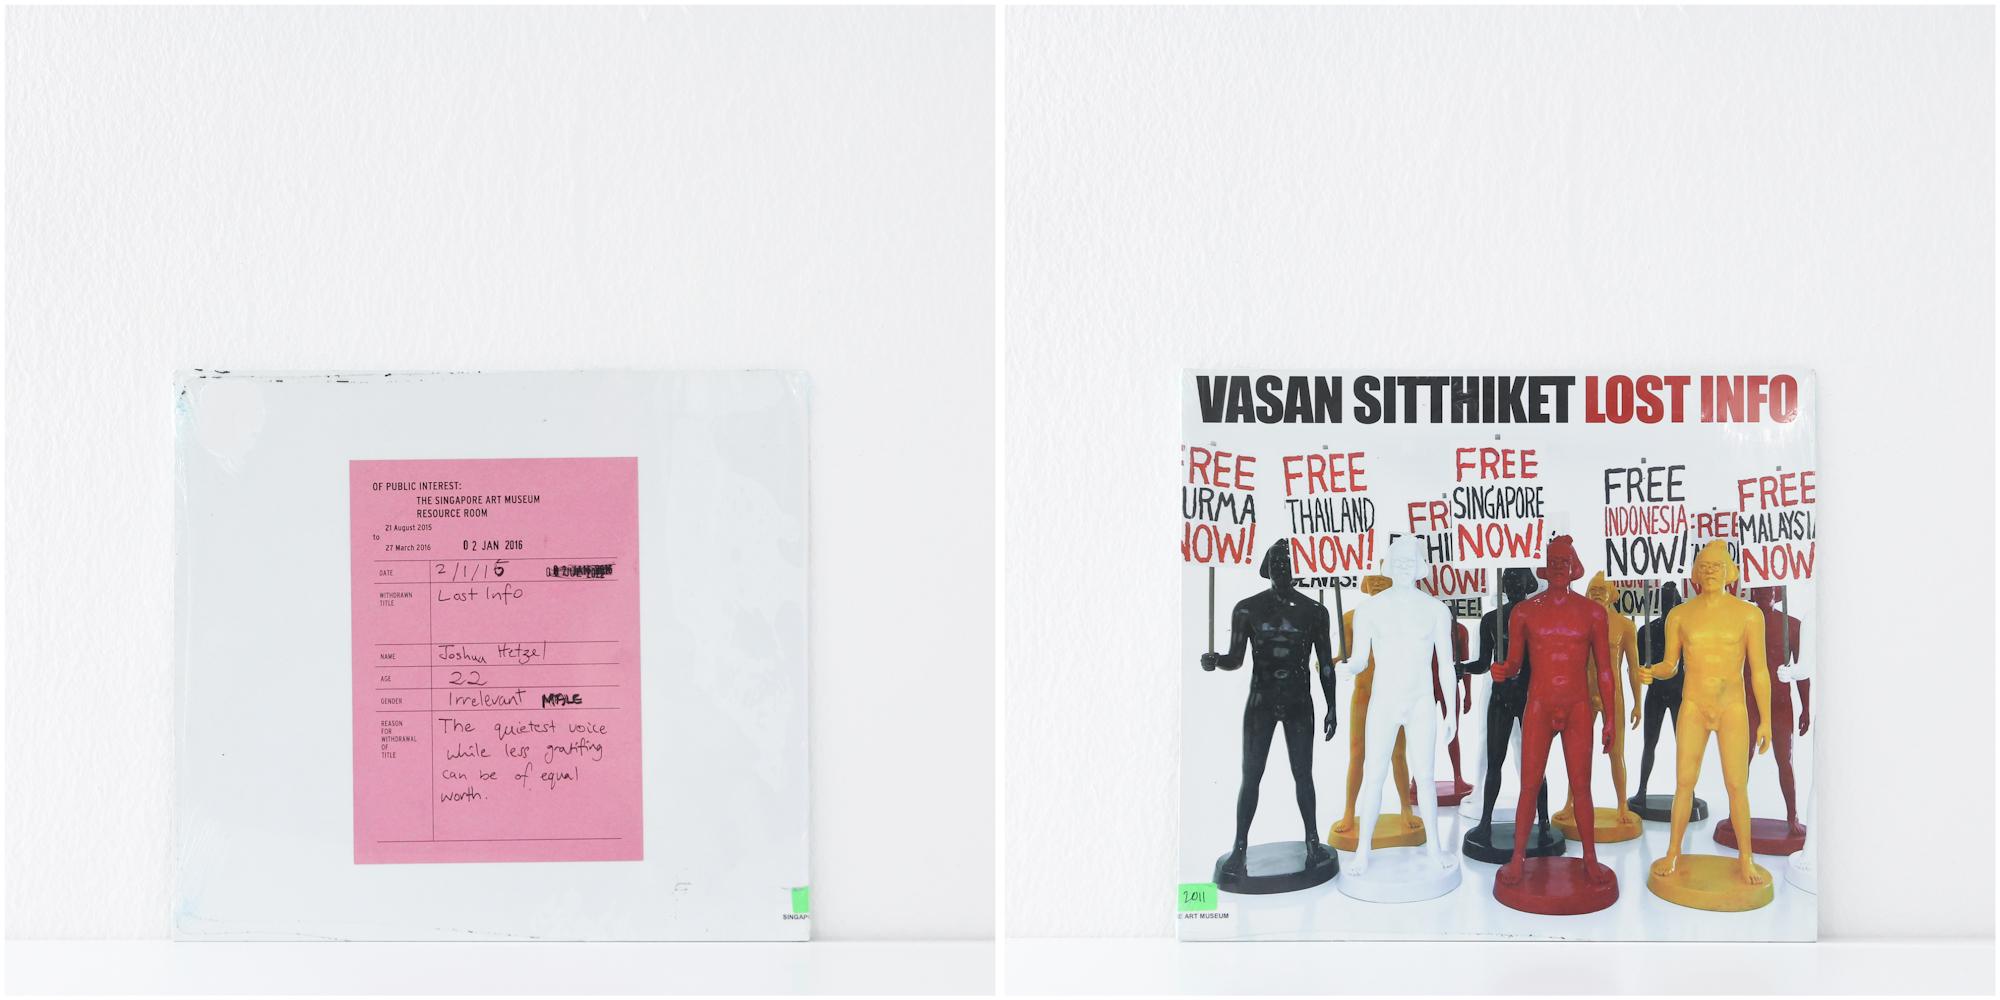 'Vasan Sitthiket, Lost Info', 2/1/16, Joshua Hetzel, 22, Male